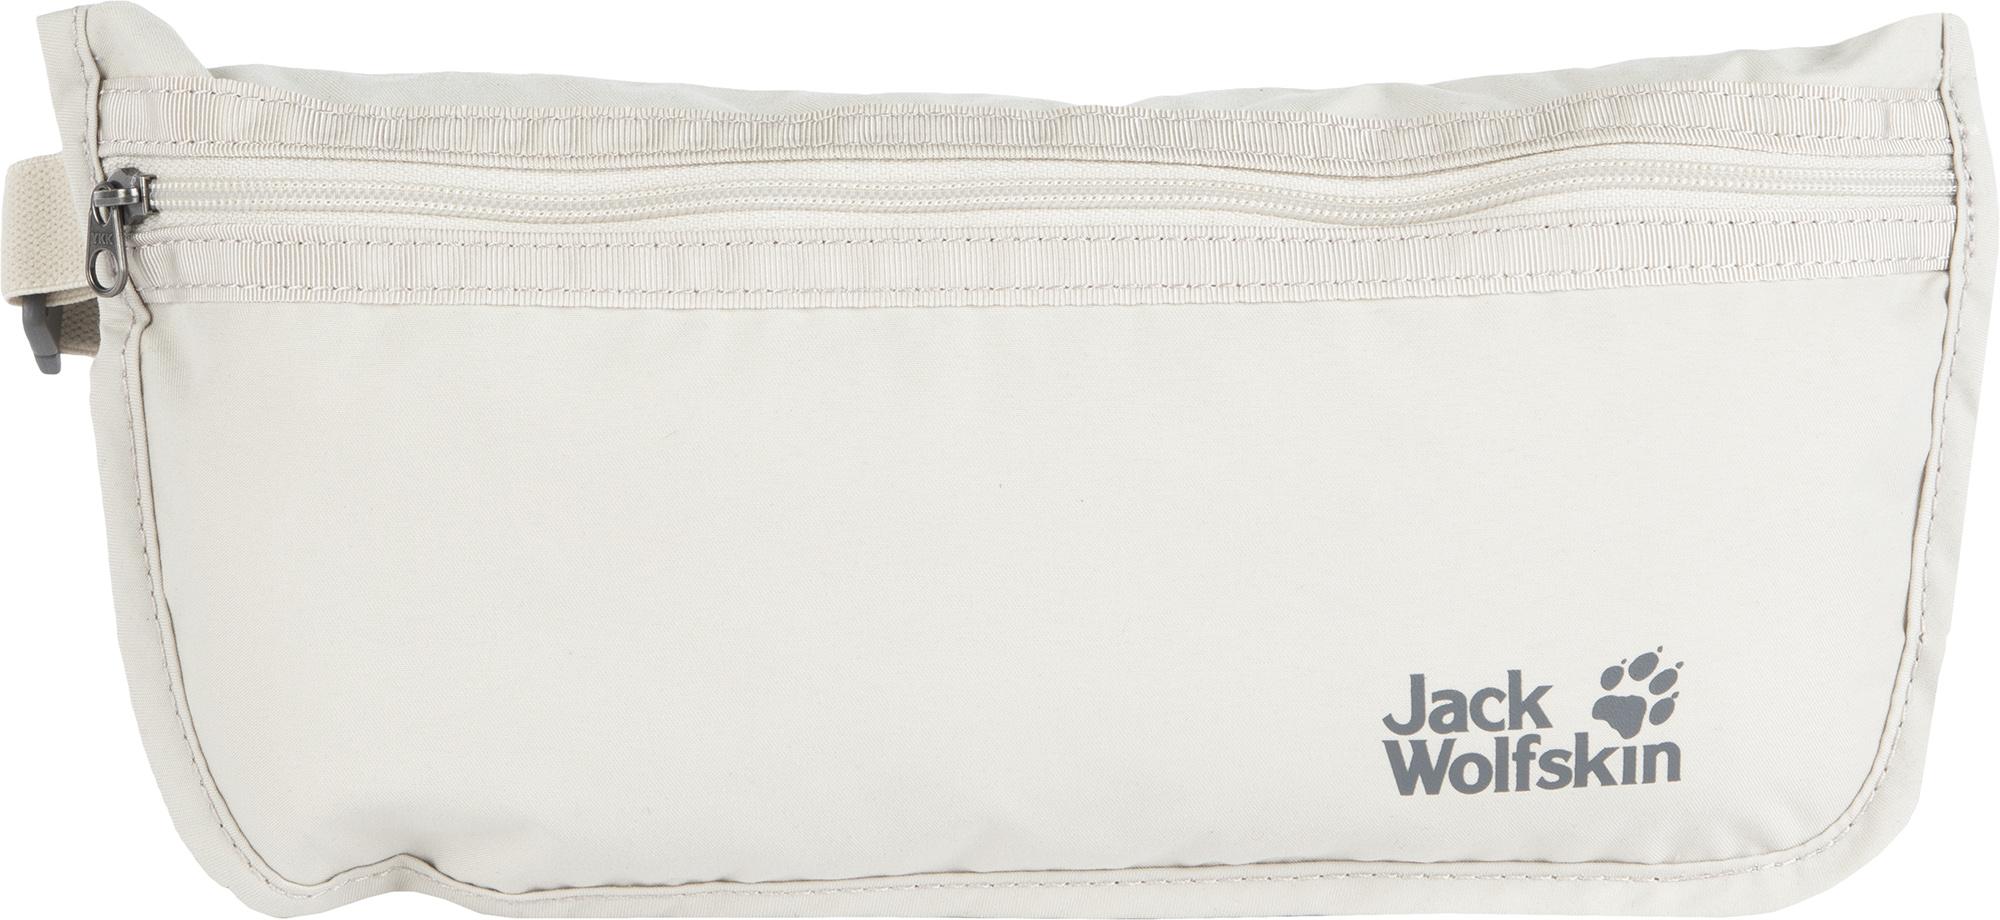 JACK WOLFSKIN Сумка JACK WOLFSKIN Document Belt joy corner drop shipping soft document bag waterproof pu leather file folder document filing bag office supplies 25 35 cm